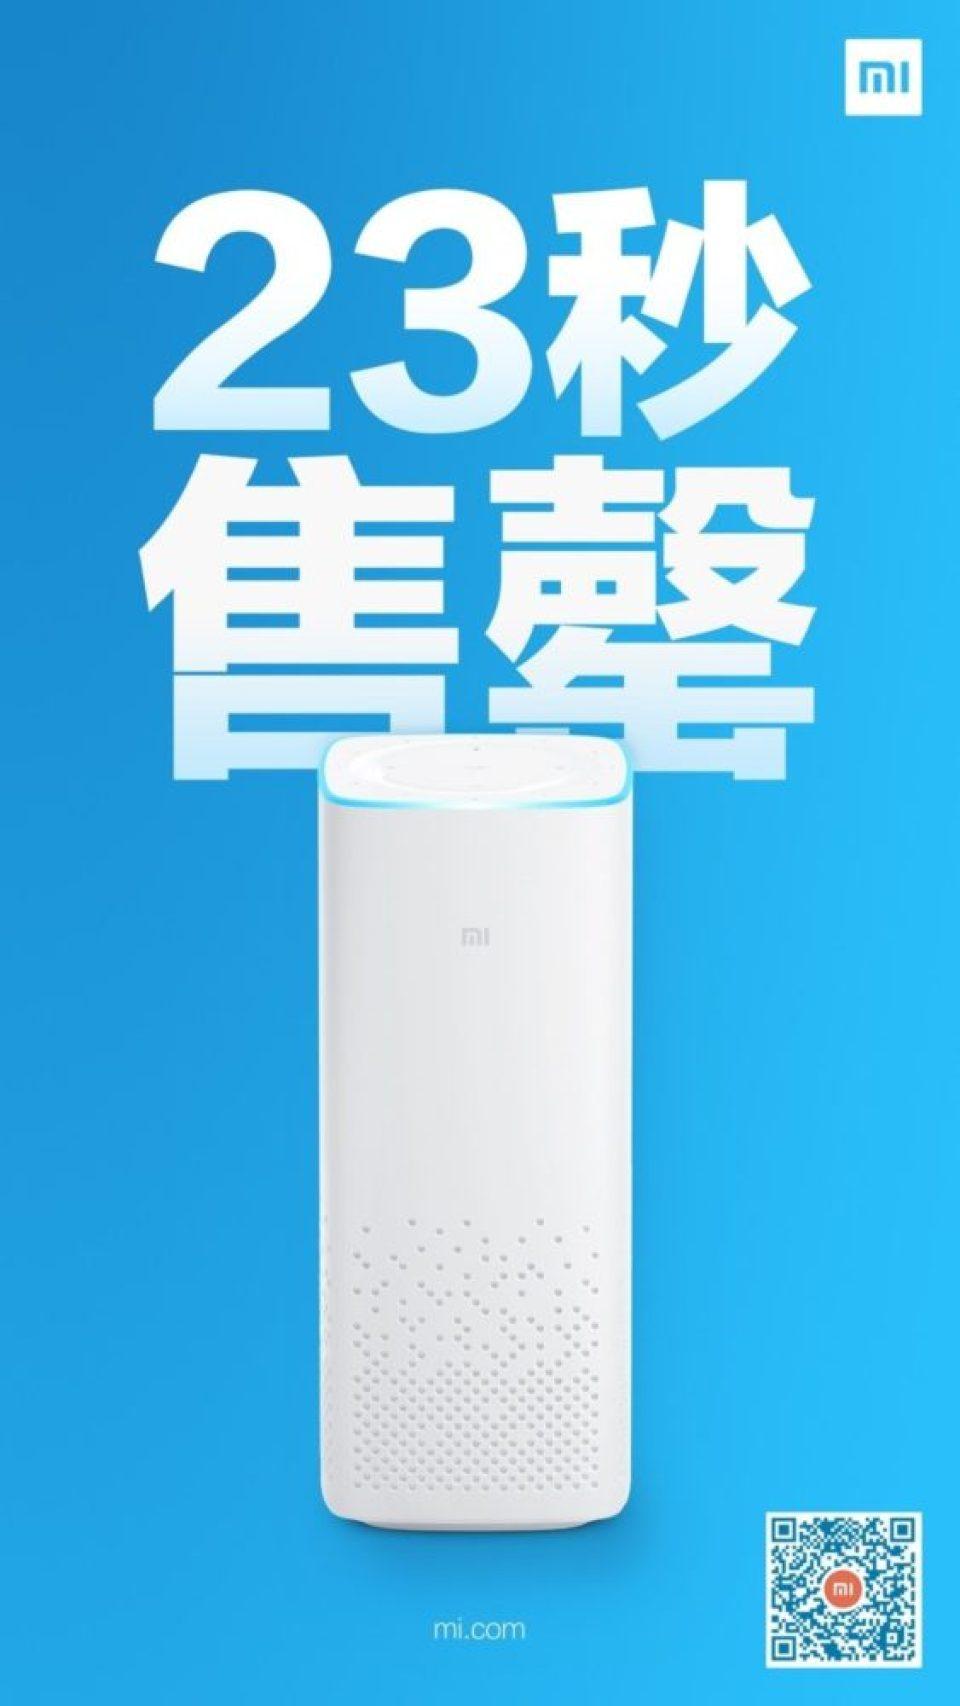 Xiaomi AI Speaker Sold out